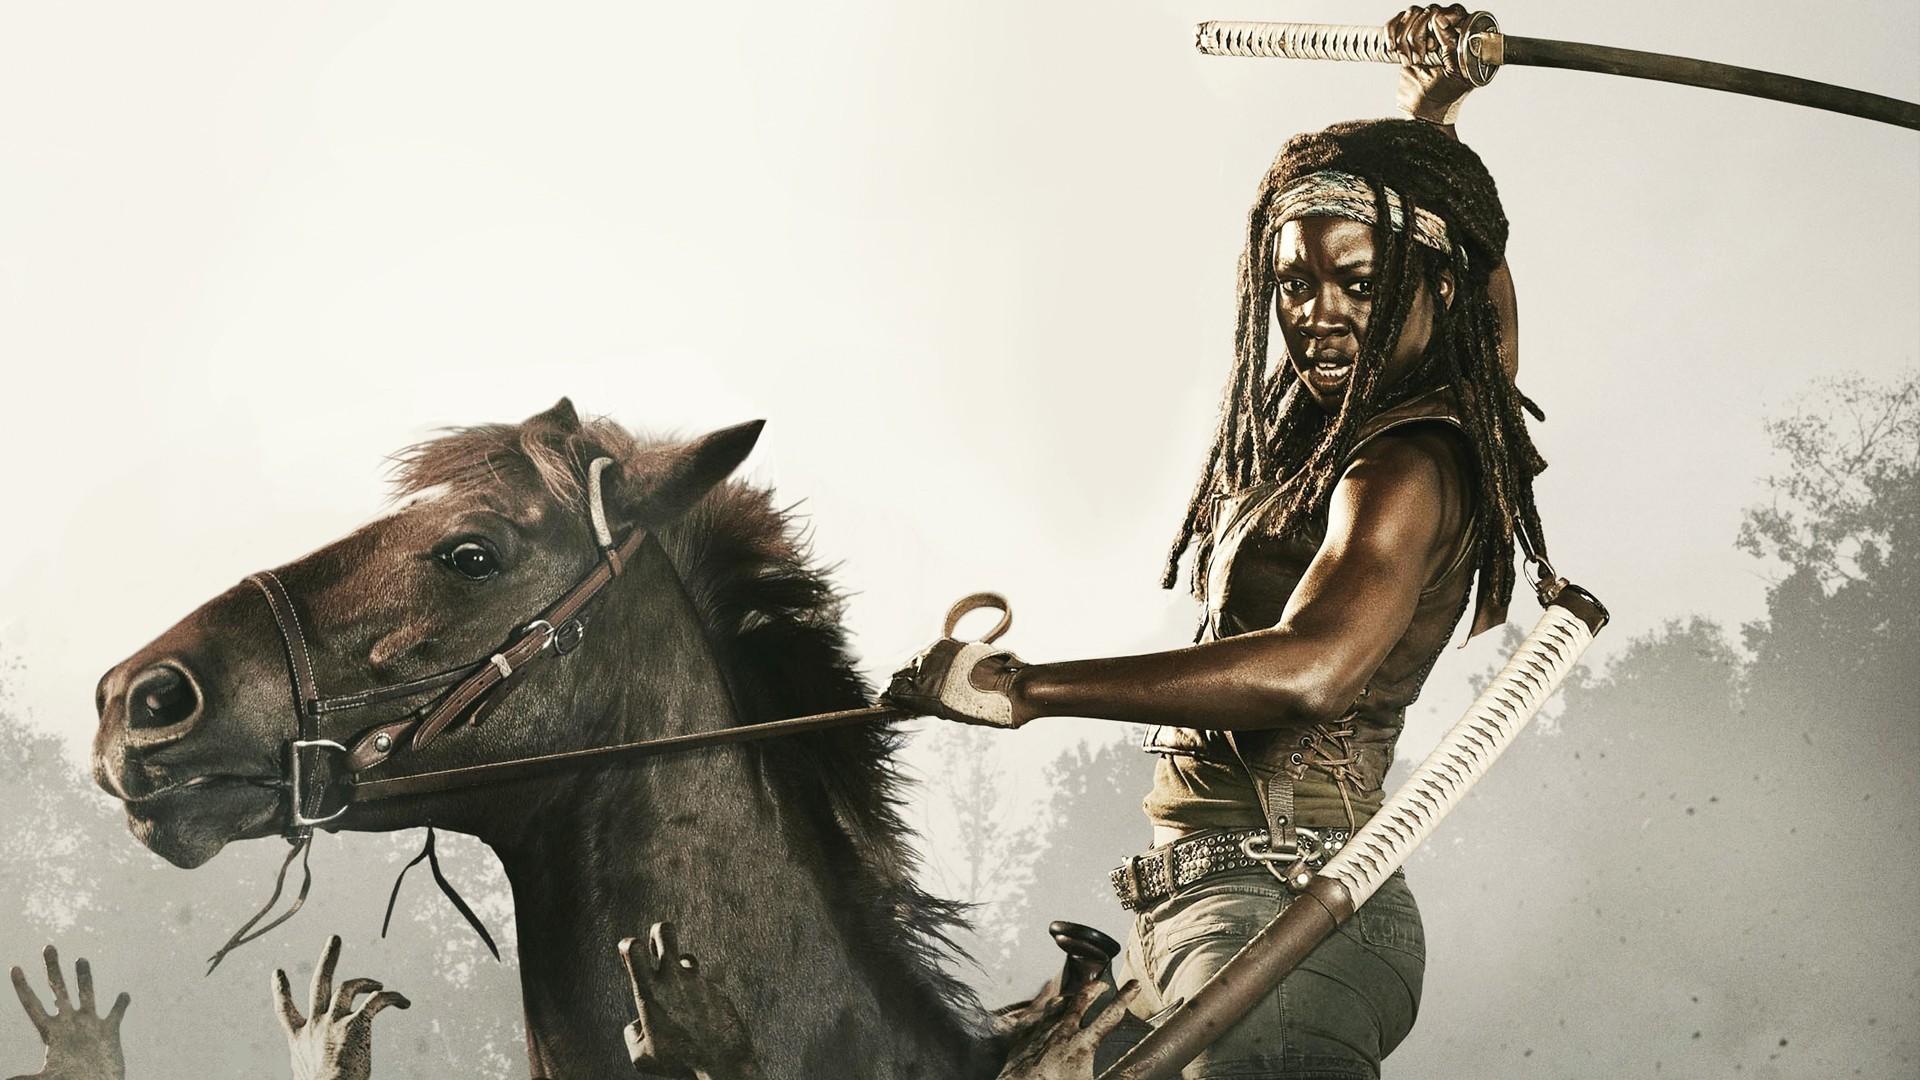 The Walking Dead Michonne Sword Katana Horse Zombies Danai Gurira fantasy